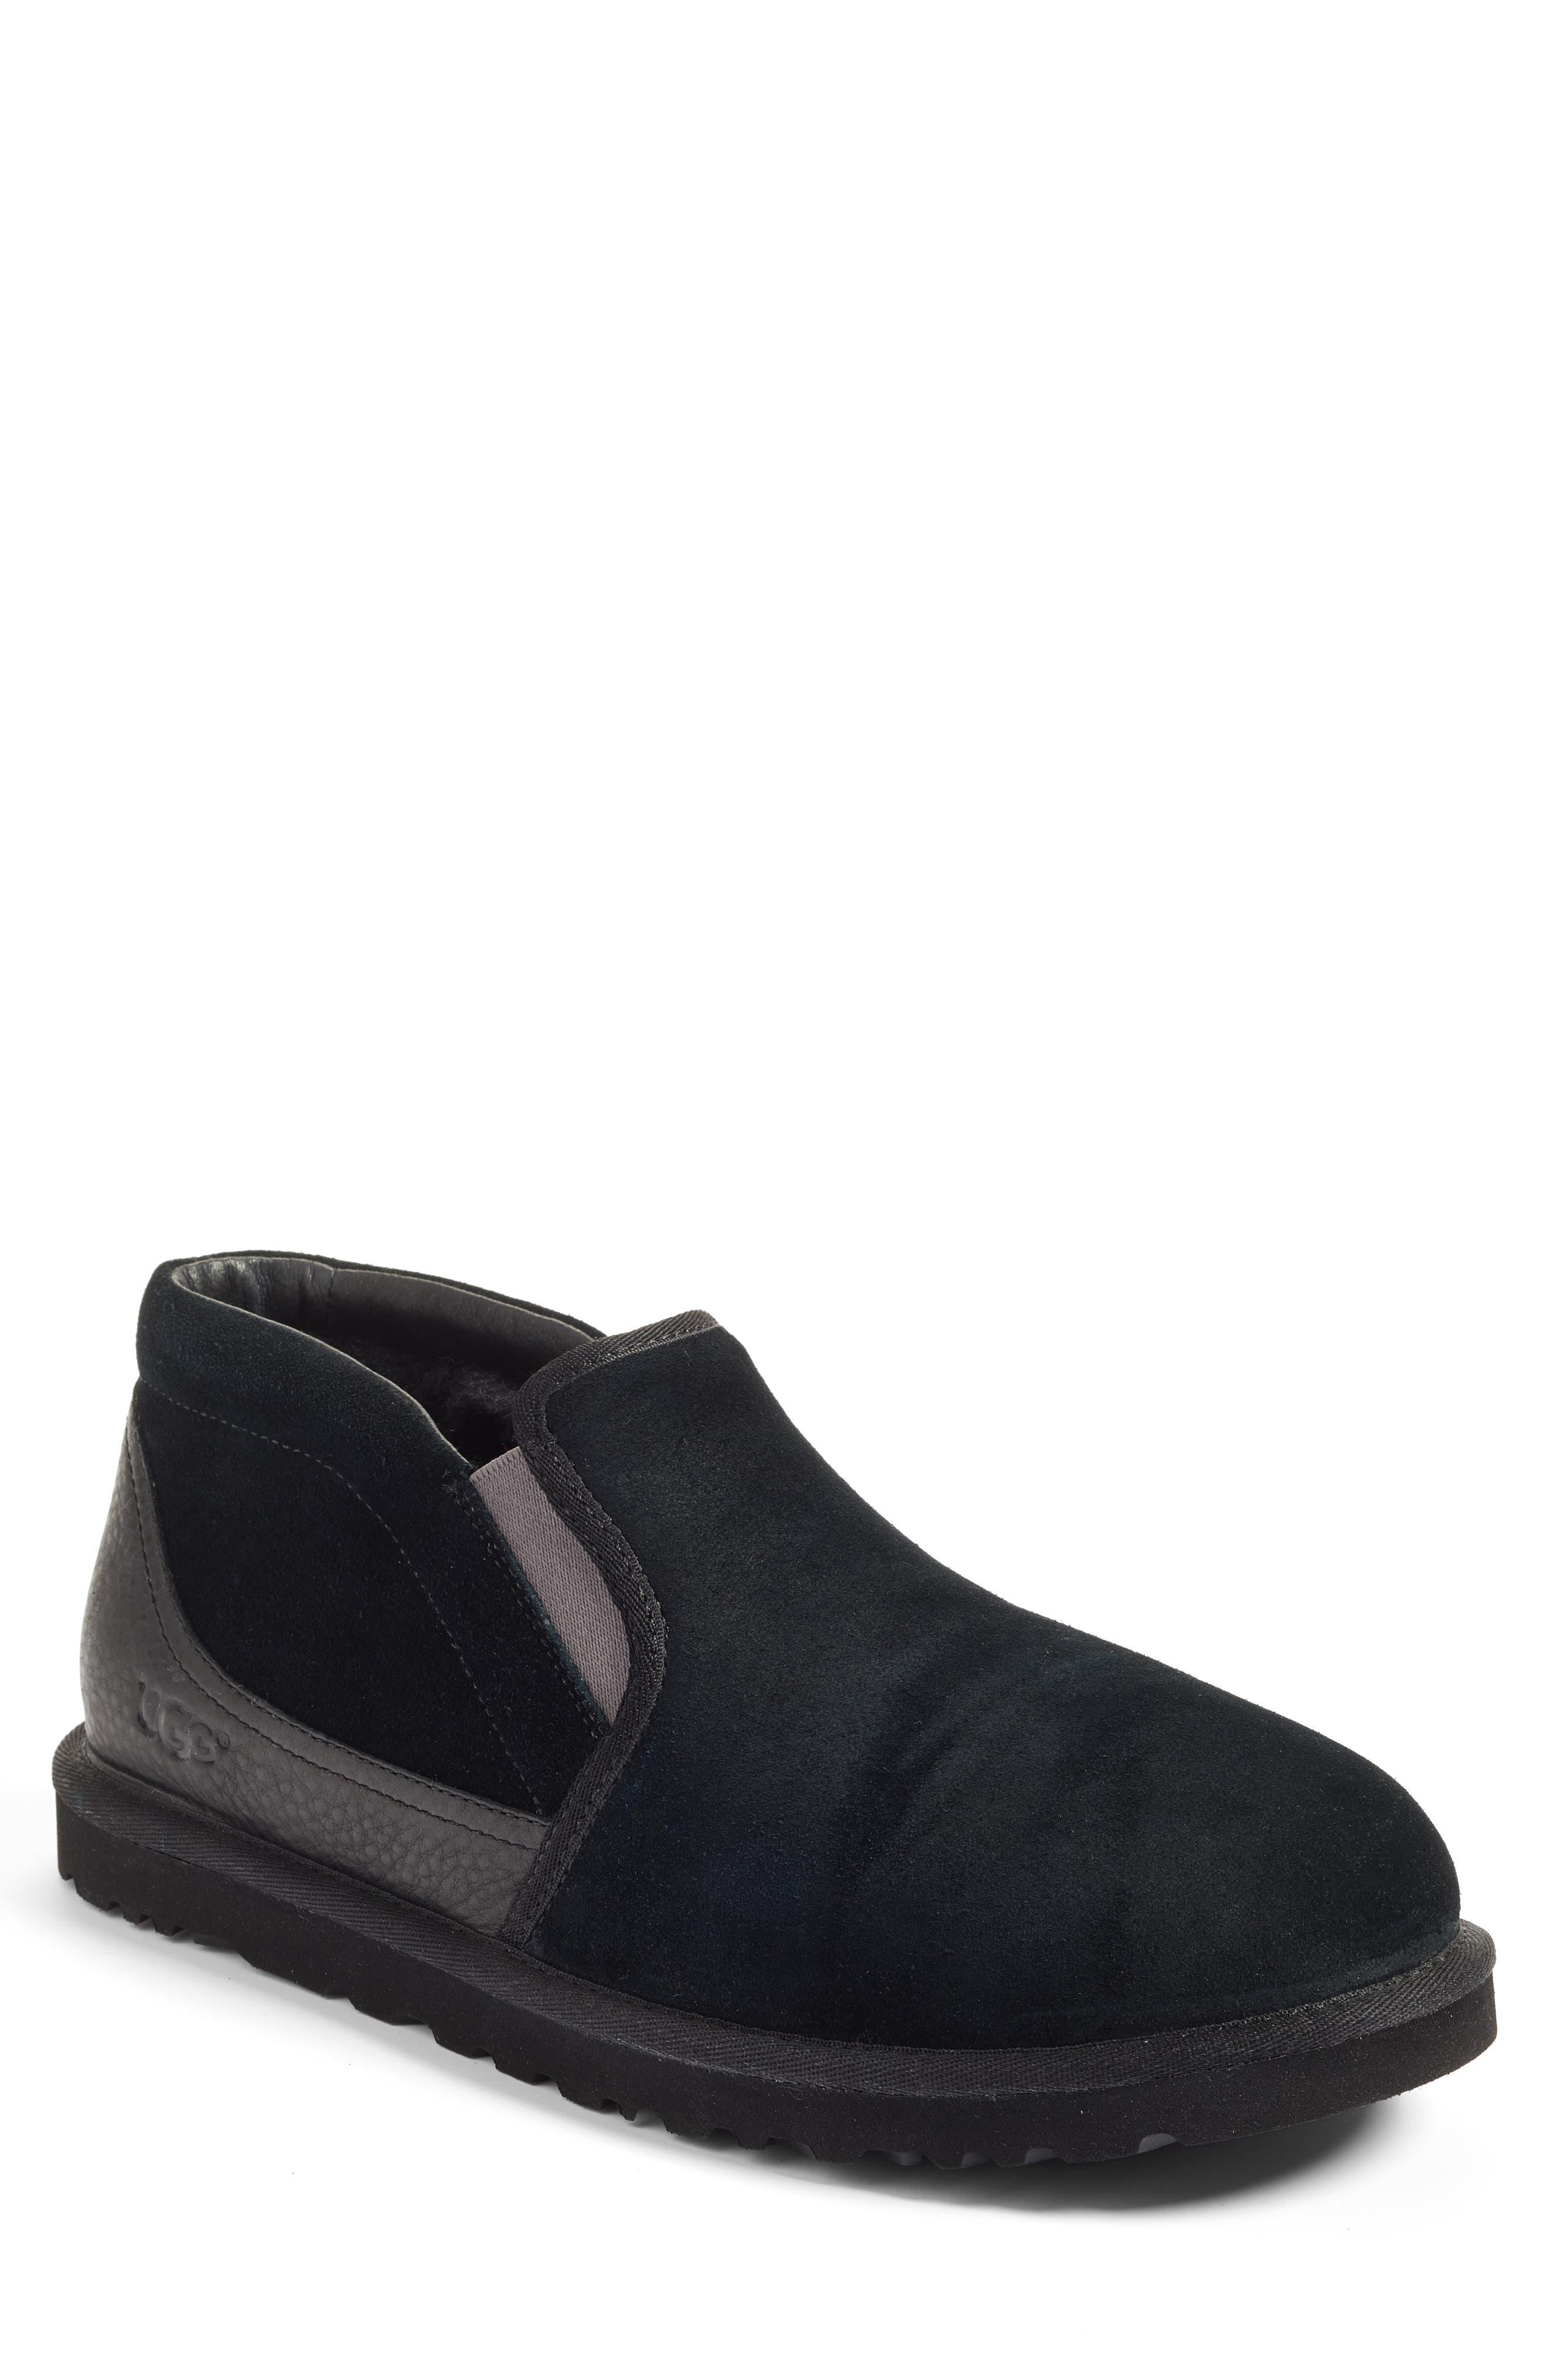 Rakel Slipper,                         Main,                         color, Black